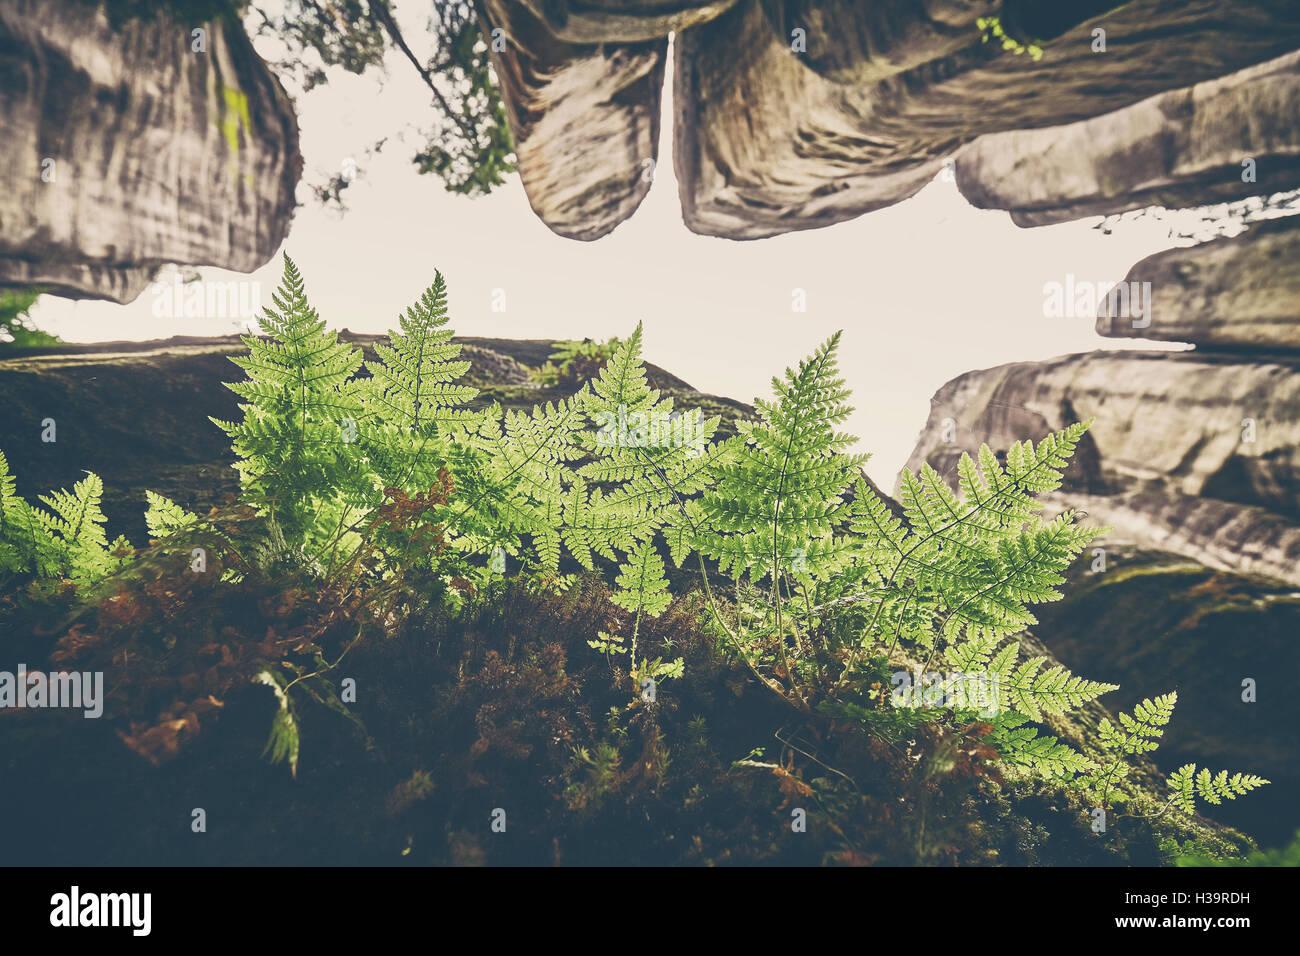 Vintage getönten Farn Blätter auf Felsen, Berge, selektiven Fokus nachschlagen. Stockbild